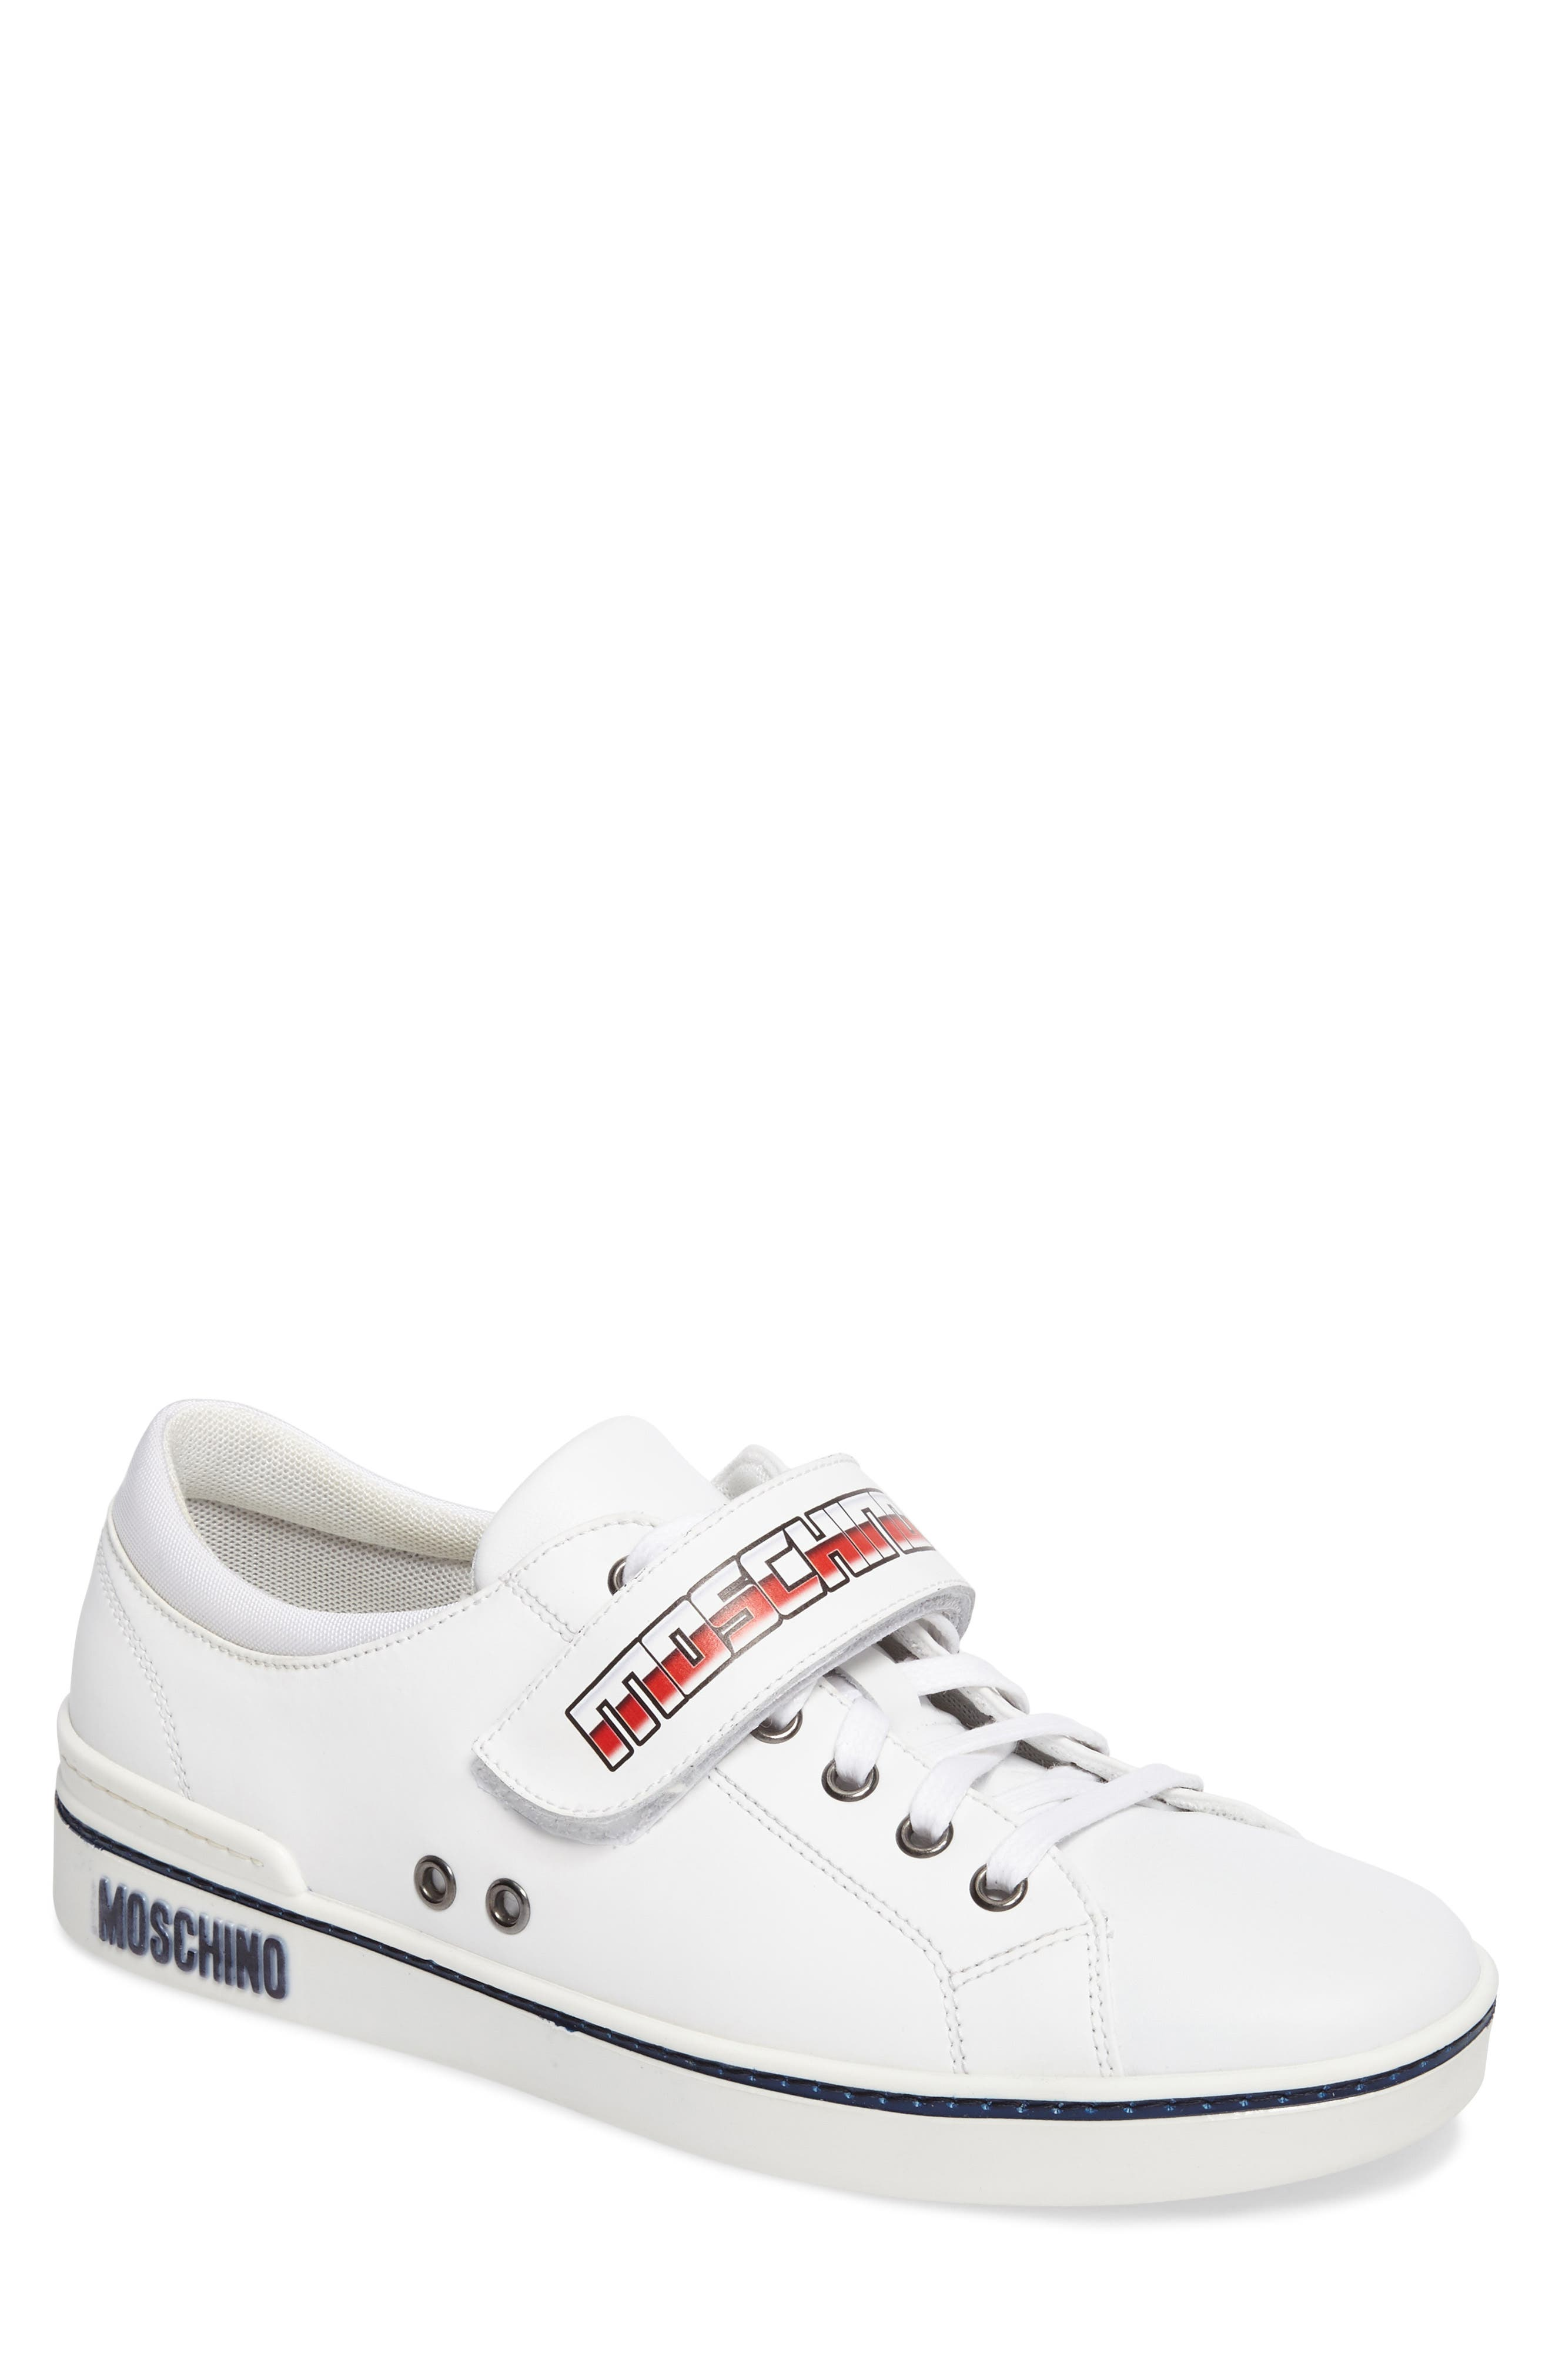 Main Image - Moschino Strap Sneaker (Men)